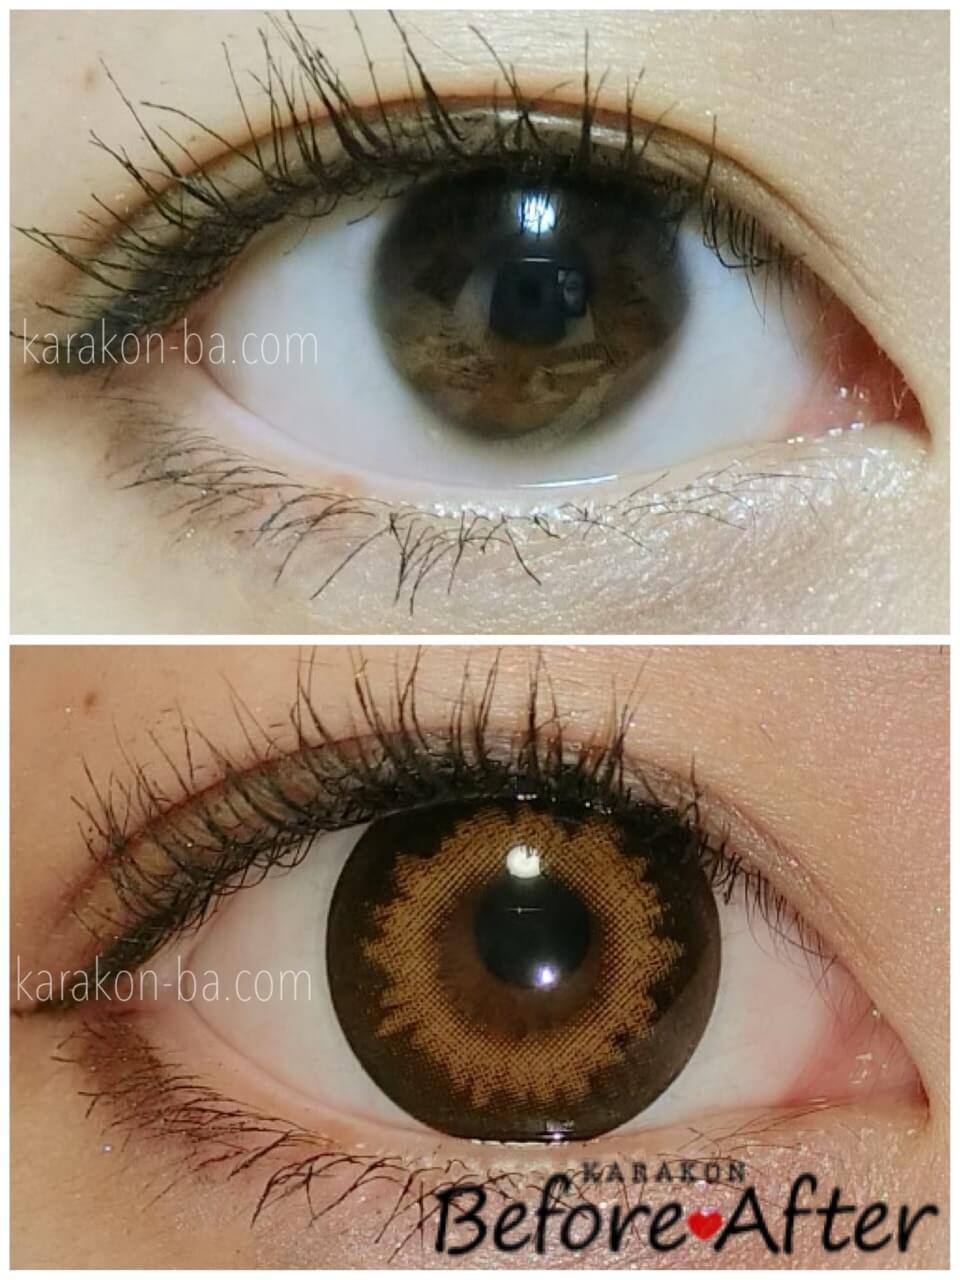 ZERU(ゼル)キャラメルのカラコン装着画像/裸眼と比較レポ